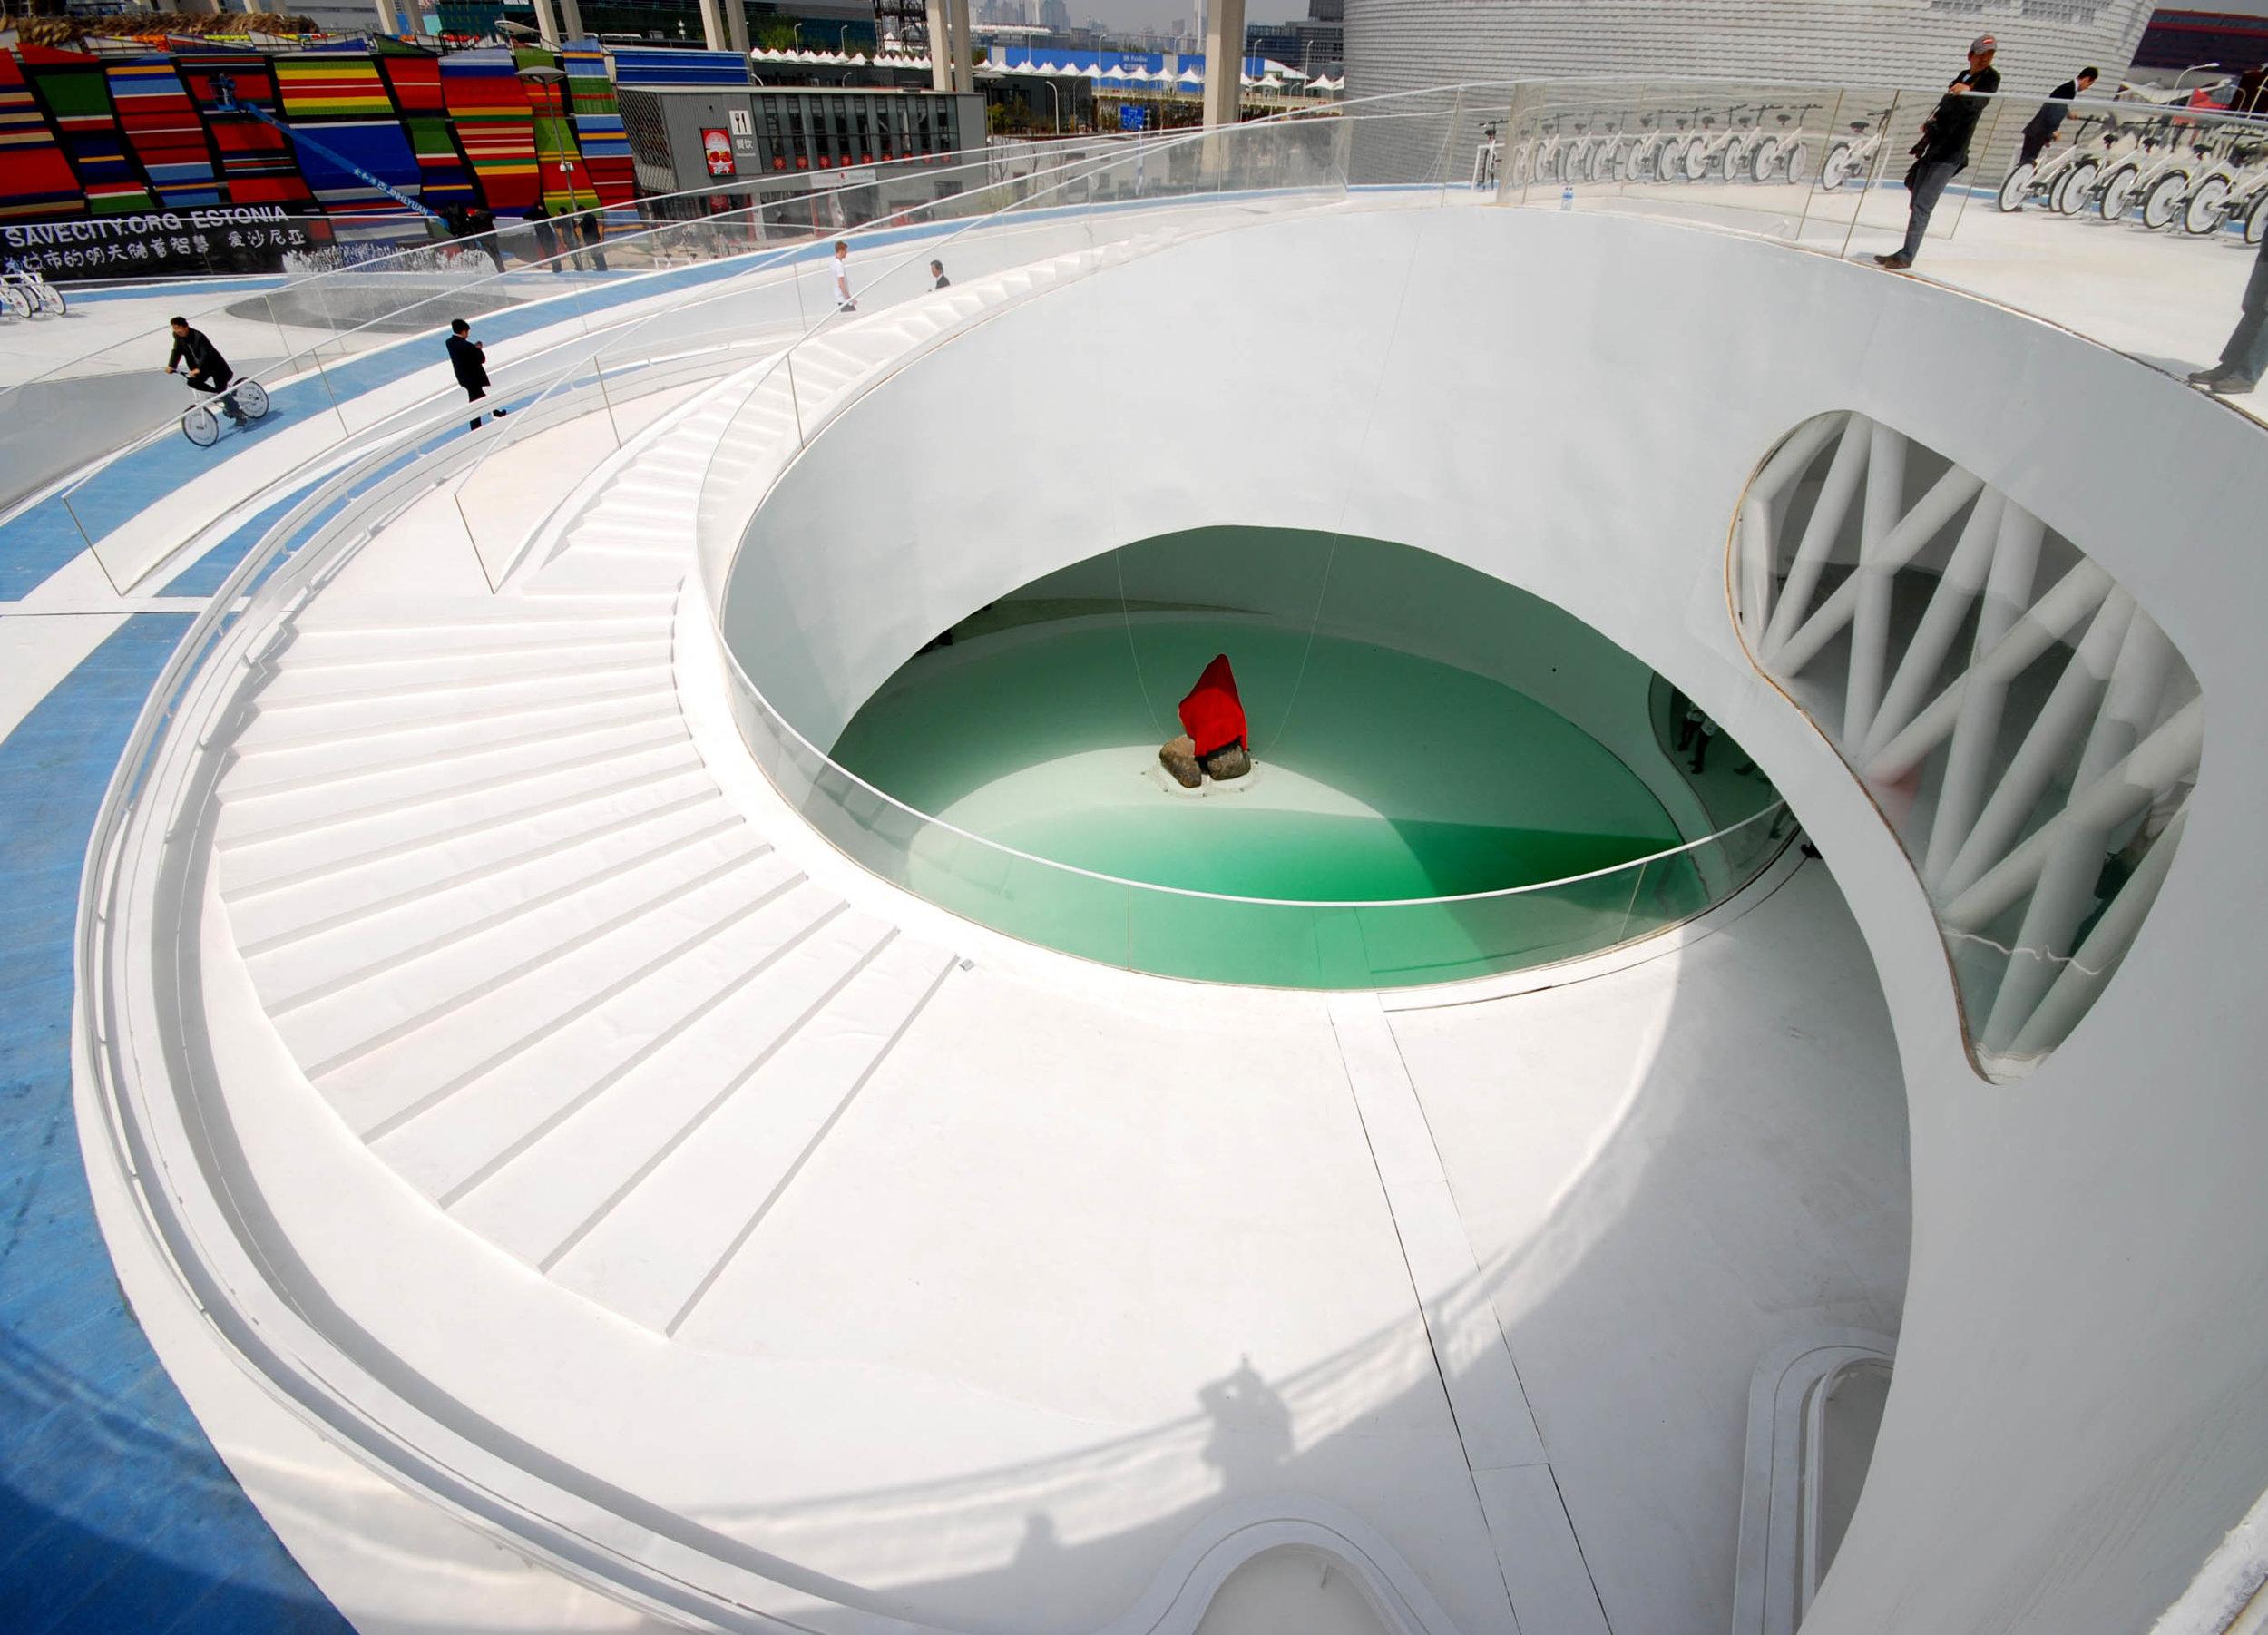 Denish Pavilion, Shanghai Expo 2010, BIG Bjarke Ingels, Nicolas Sterling, Arup, Arup AGU, Structural engineer, Cecil balmond